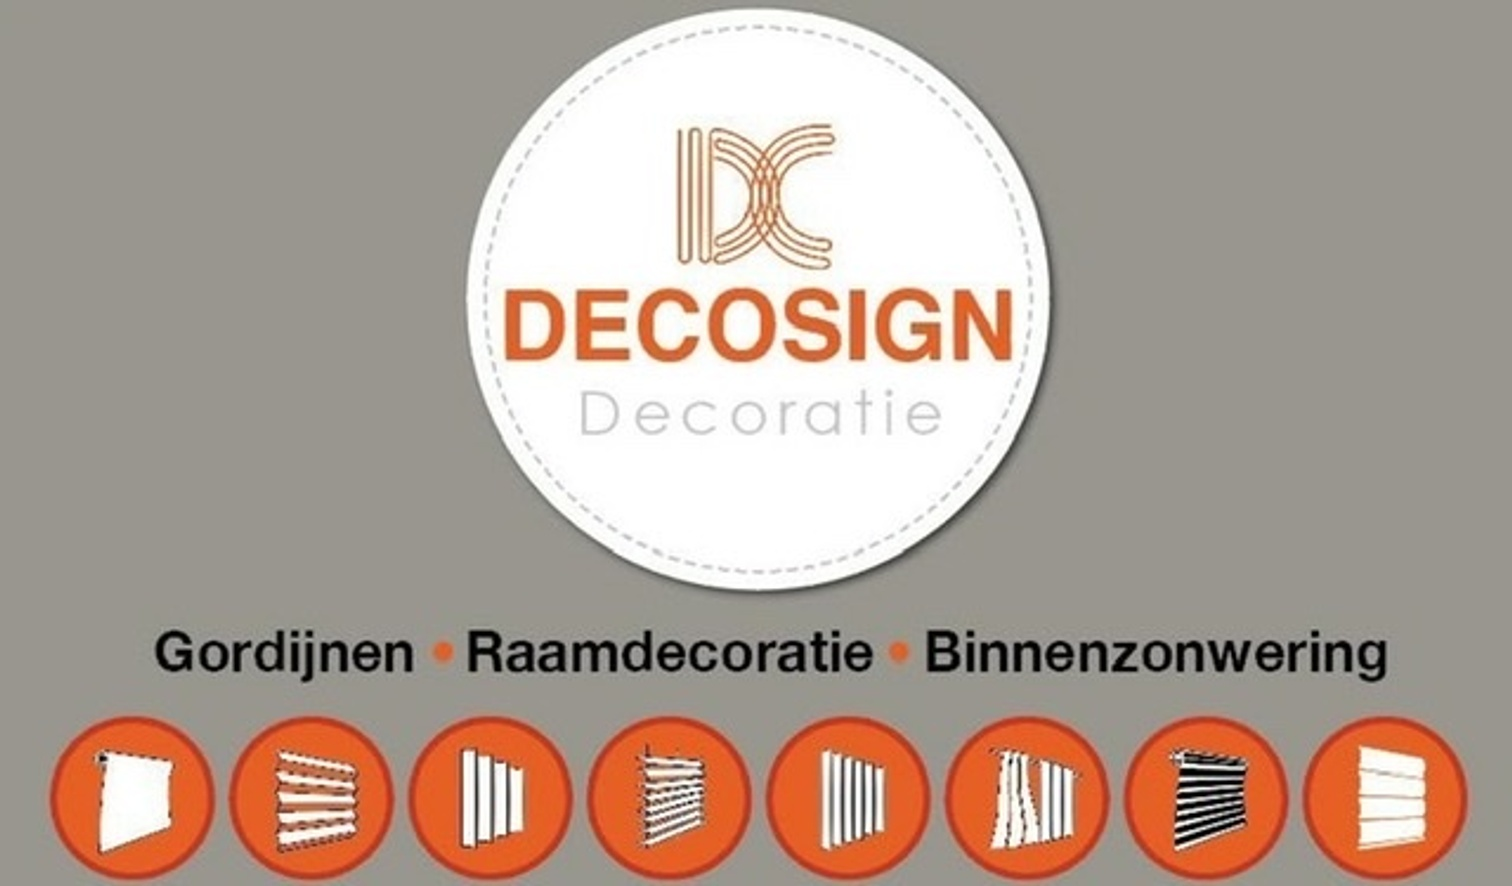 logo Decosign